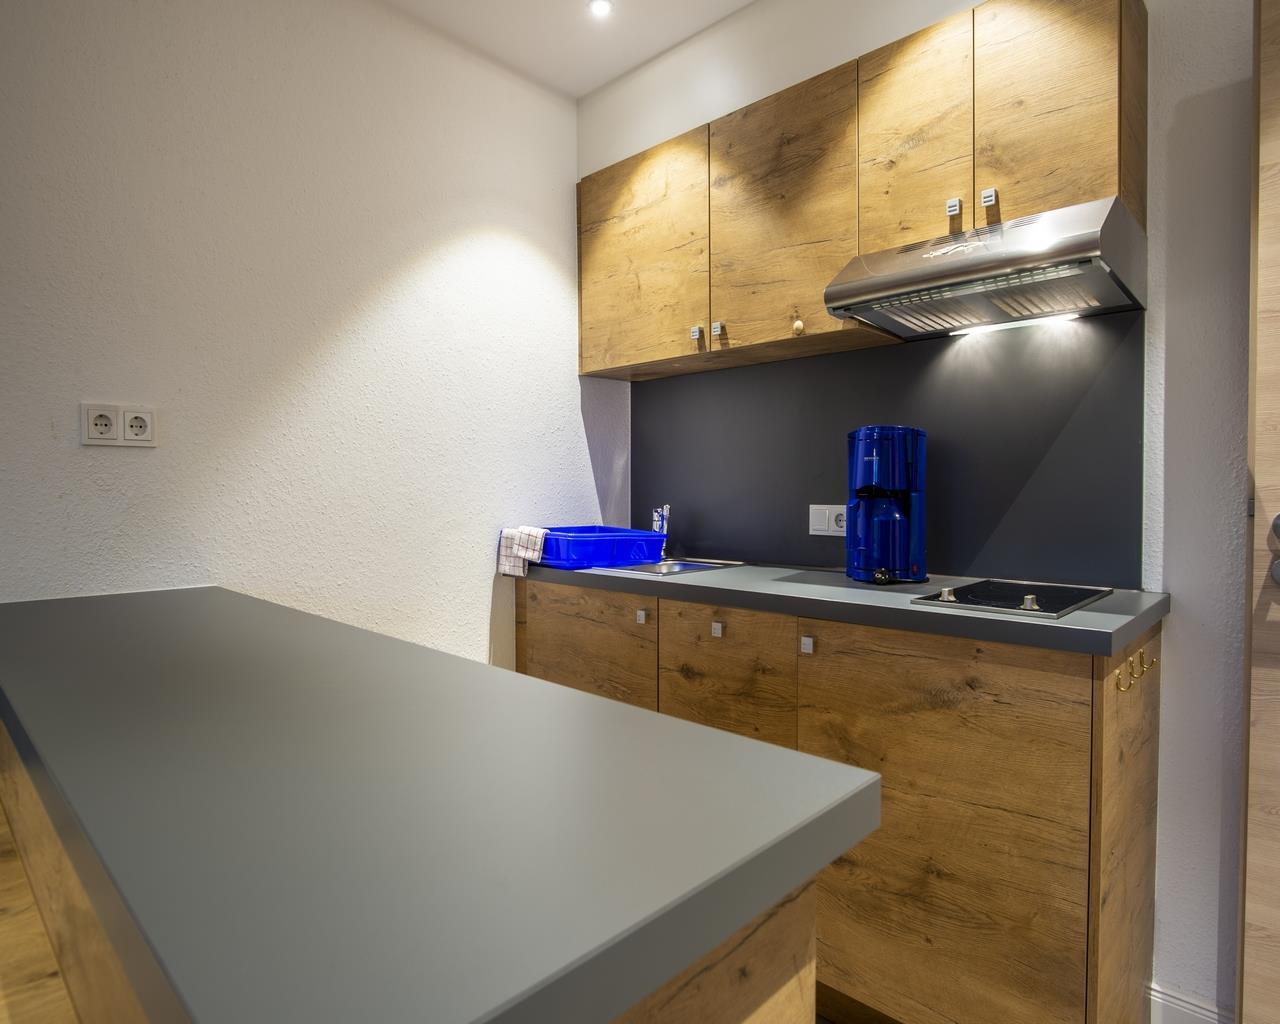 Appartement de vacances Gästehaus Boersch - Familie Jochum Apartment/Südterrasse/Dusche, WC, Nr. 2 (1483184), Riezlern (AT), Kleinwalsertal, Vorarlberg, Autriche, image 24